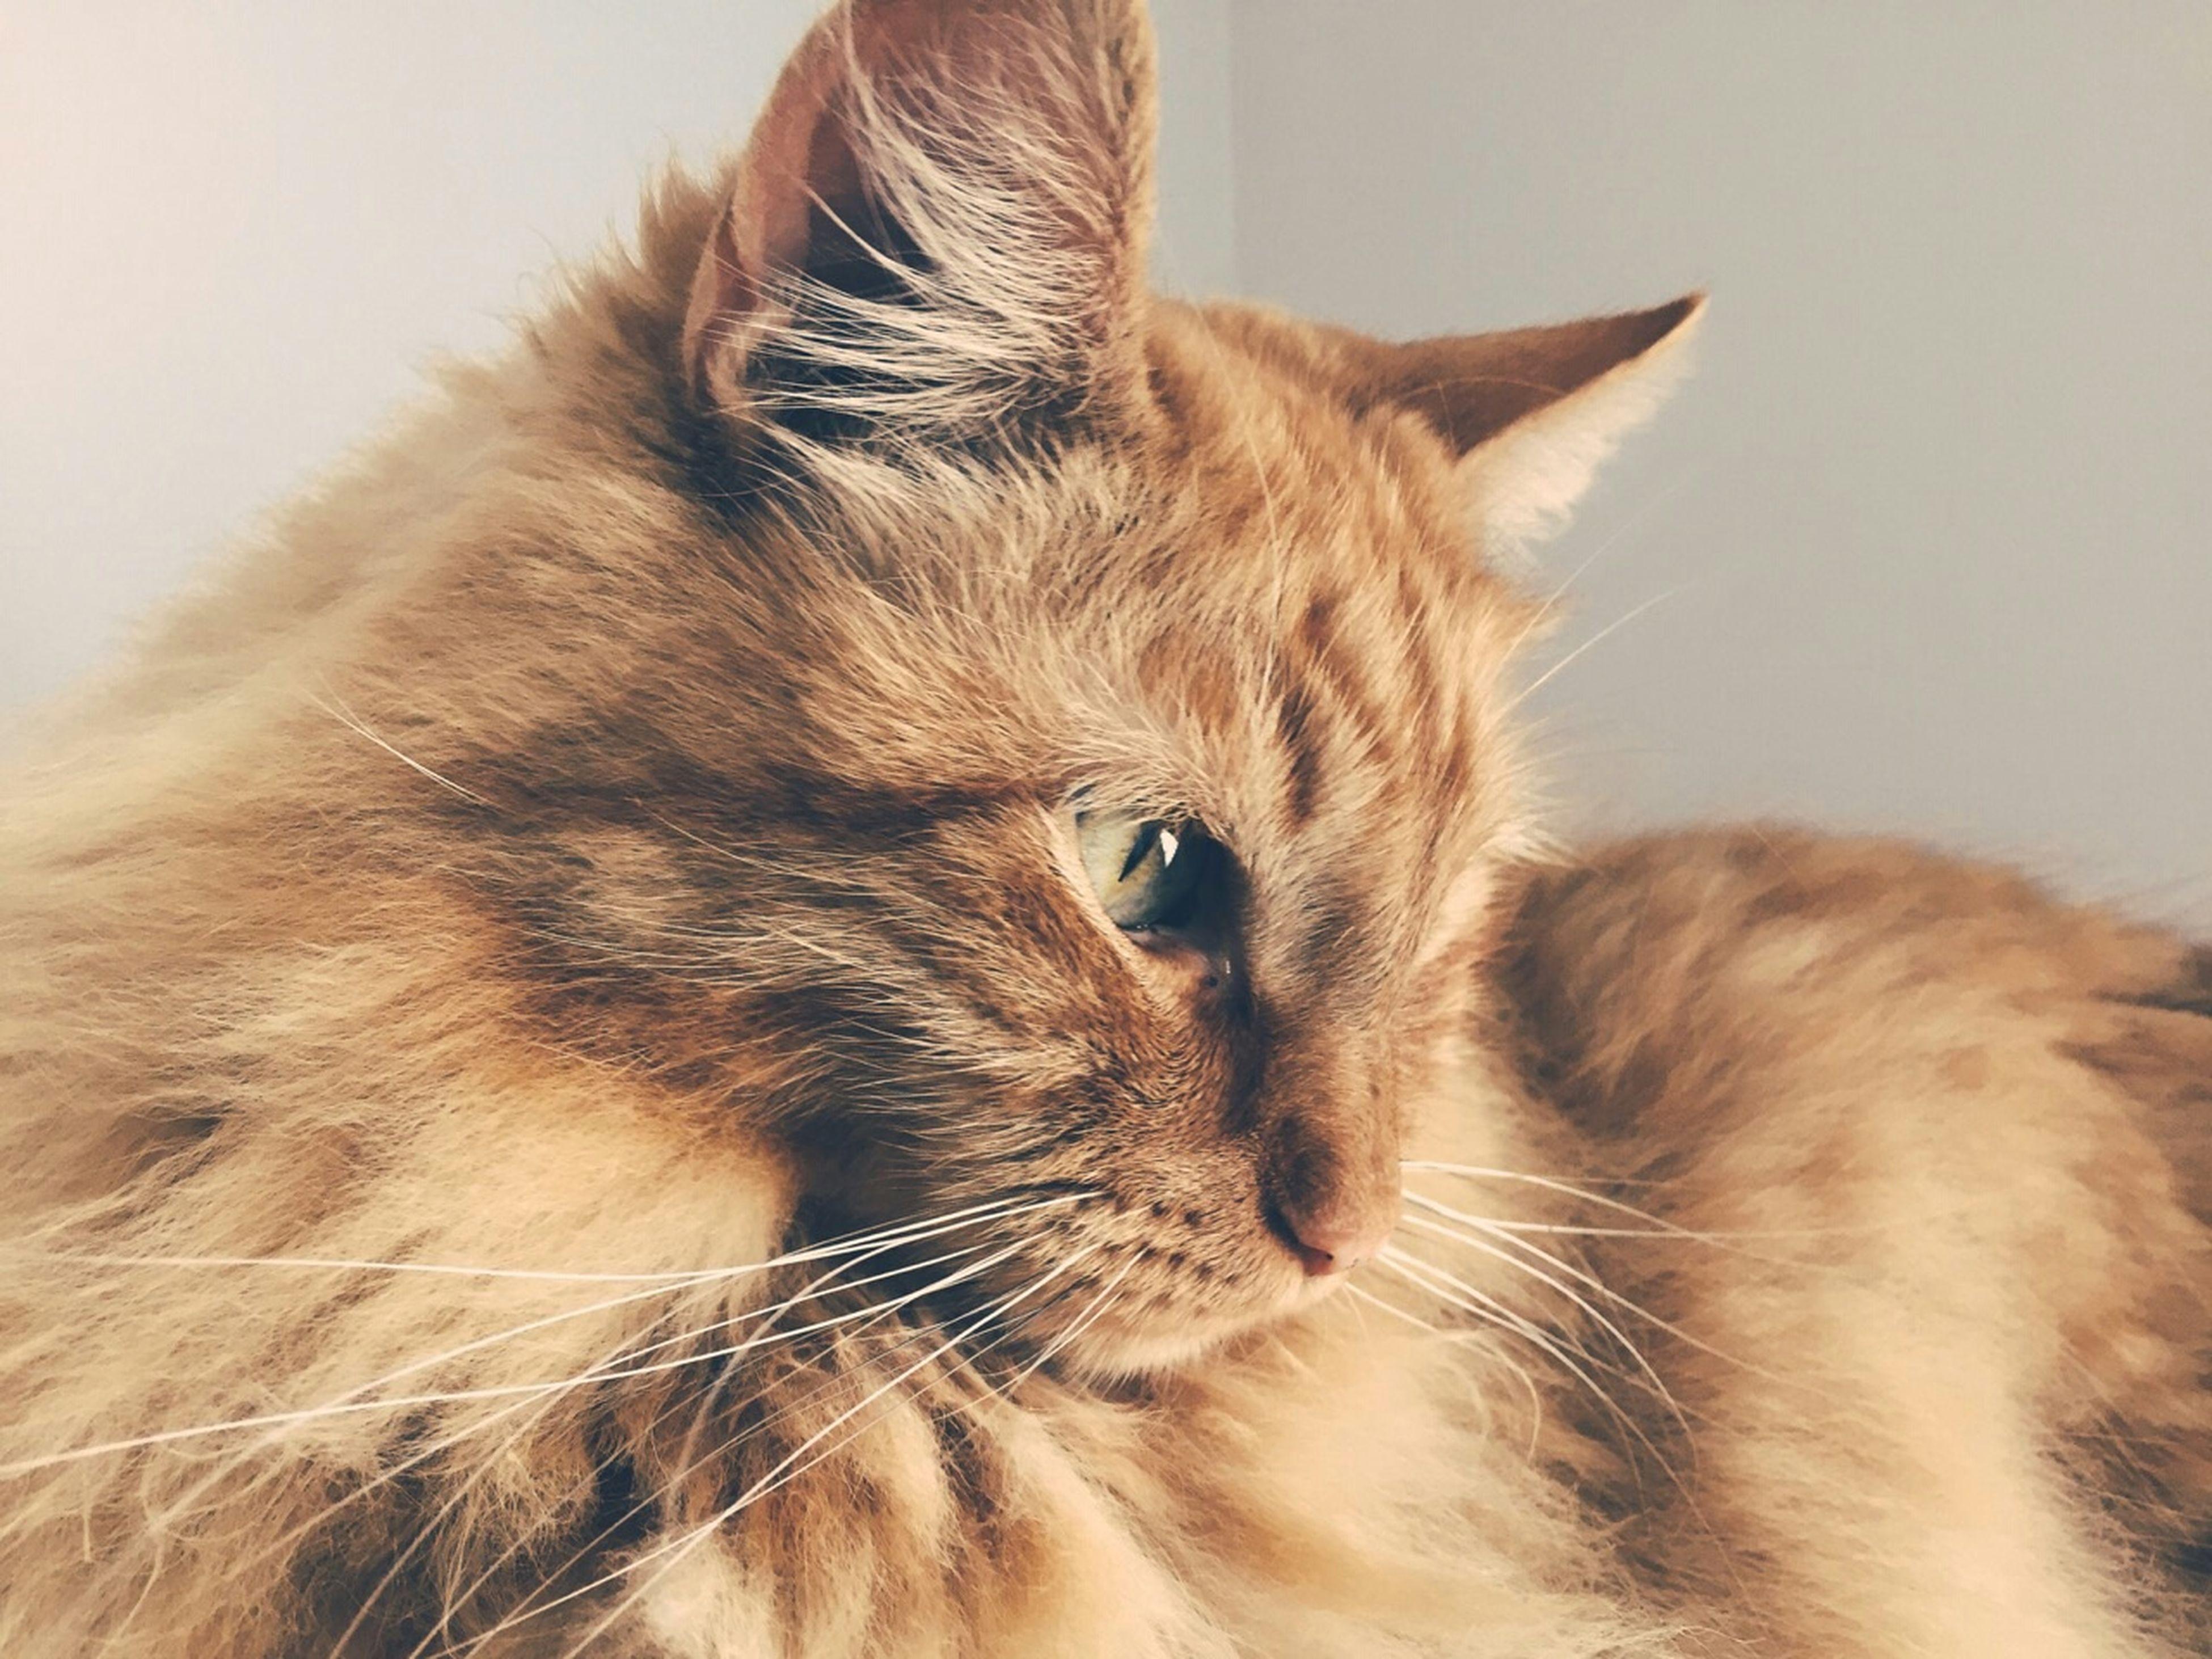 domestic cat, one animal, cat, animal themes, domestic animals, pets, feline, mammal, indoors, whisker, animal head, close-up, looking away, relaxation, animal body part, studio shot, animal hair, alertness, animal eye, portrait